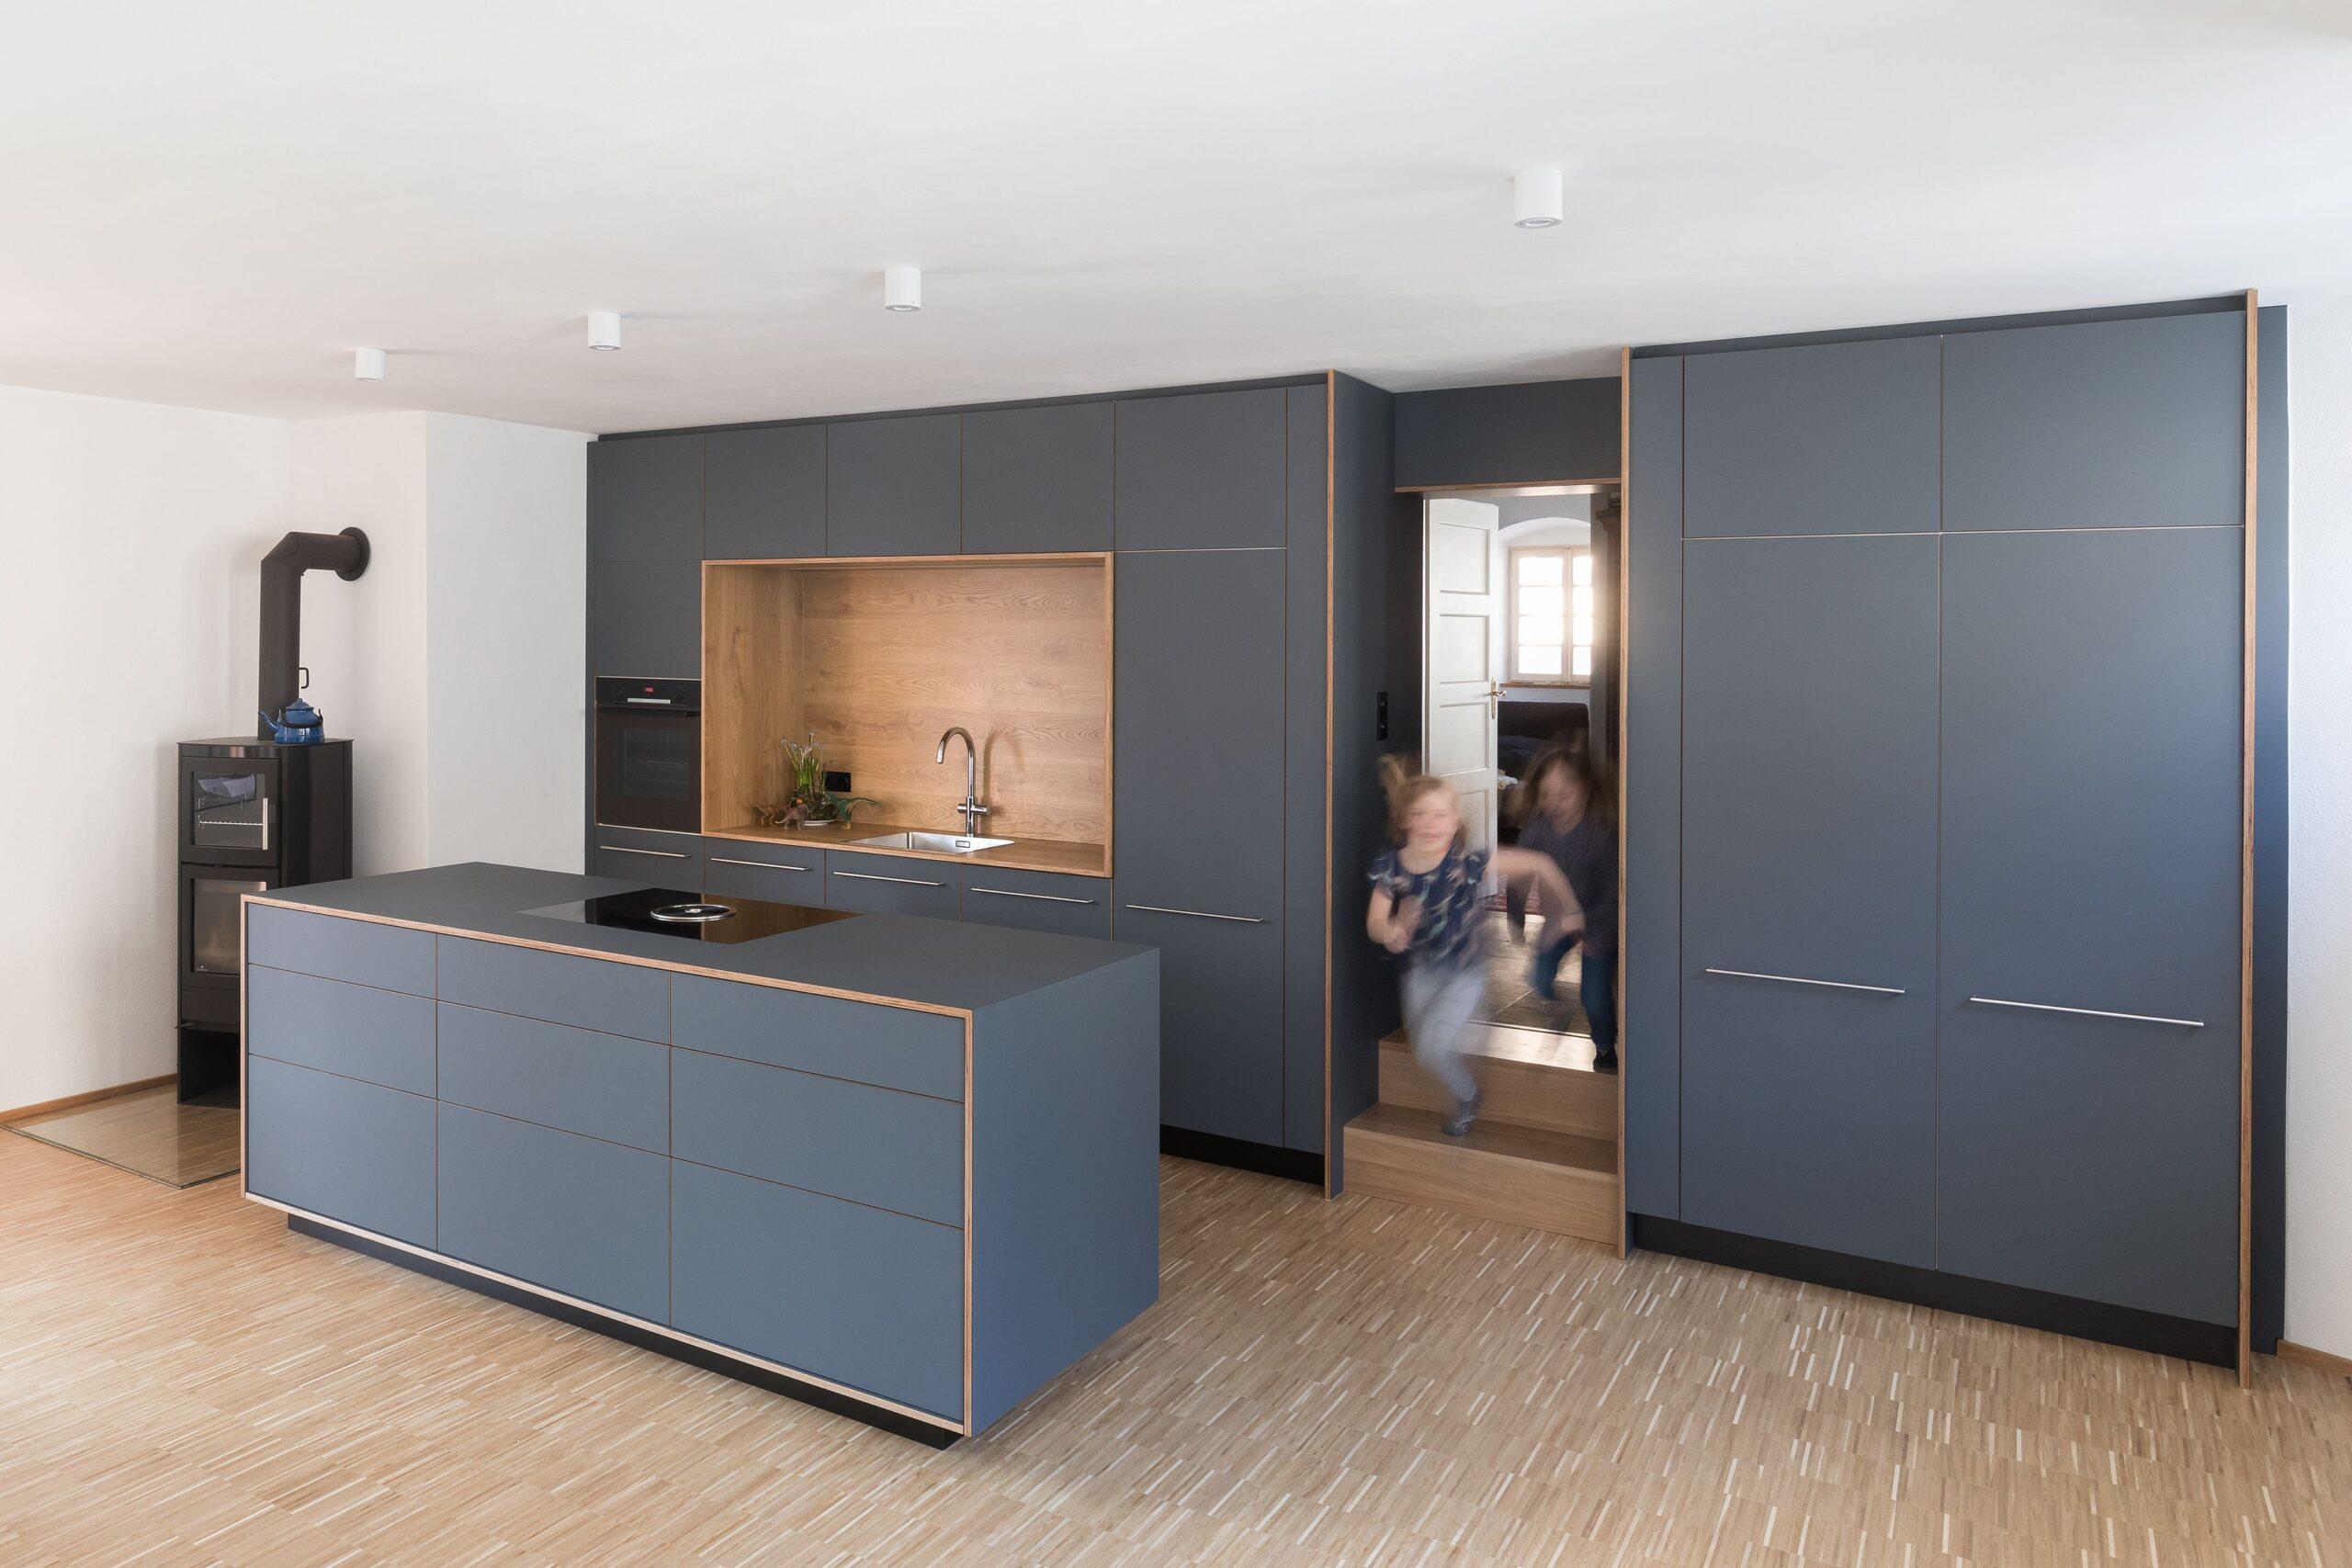 Full Size of Kücheninsel Kcheninsel Kochinsel Grau Designerkche Design Modern Wohnzimmer Kücheninsel